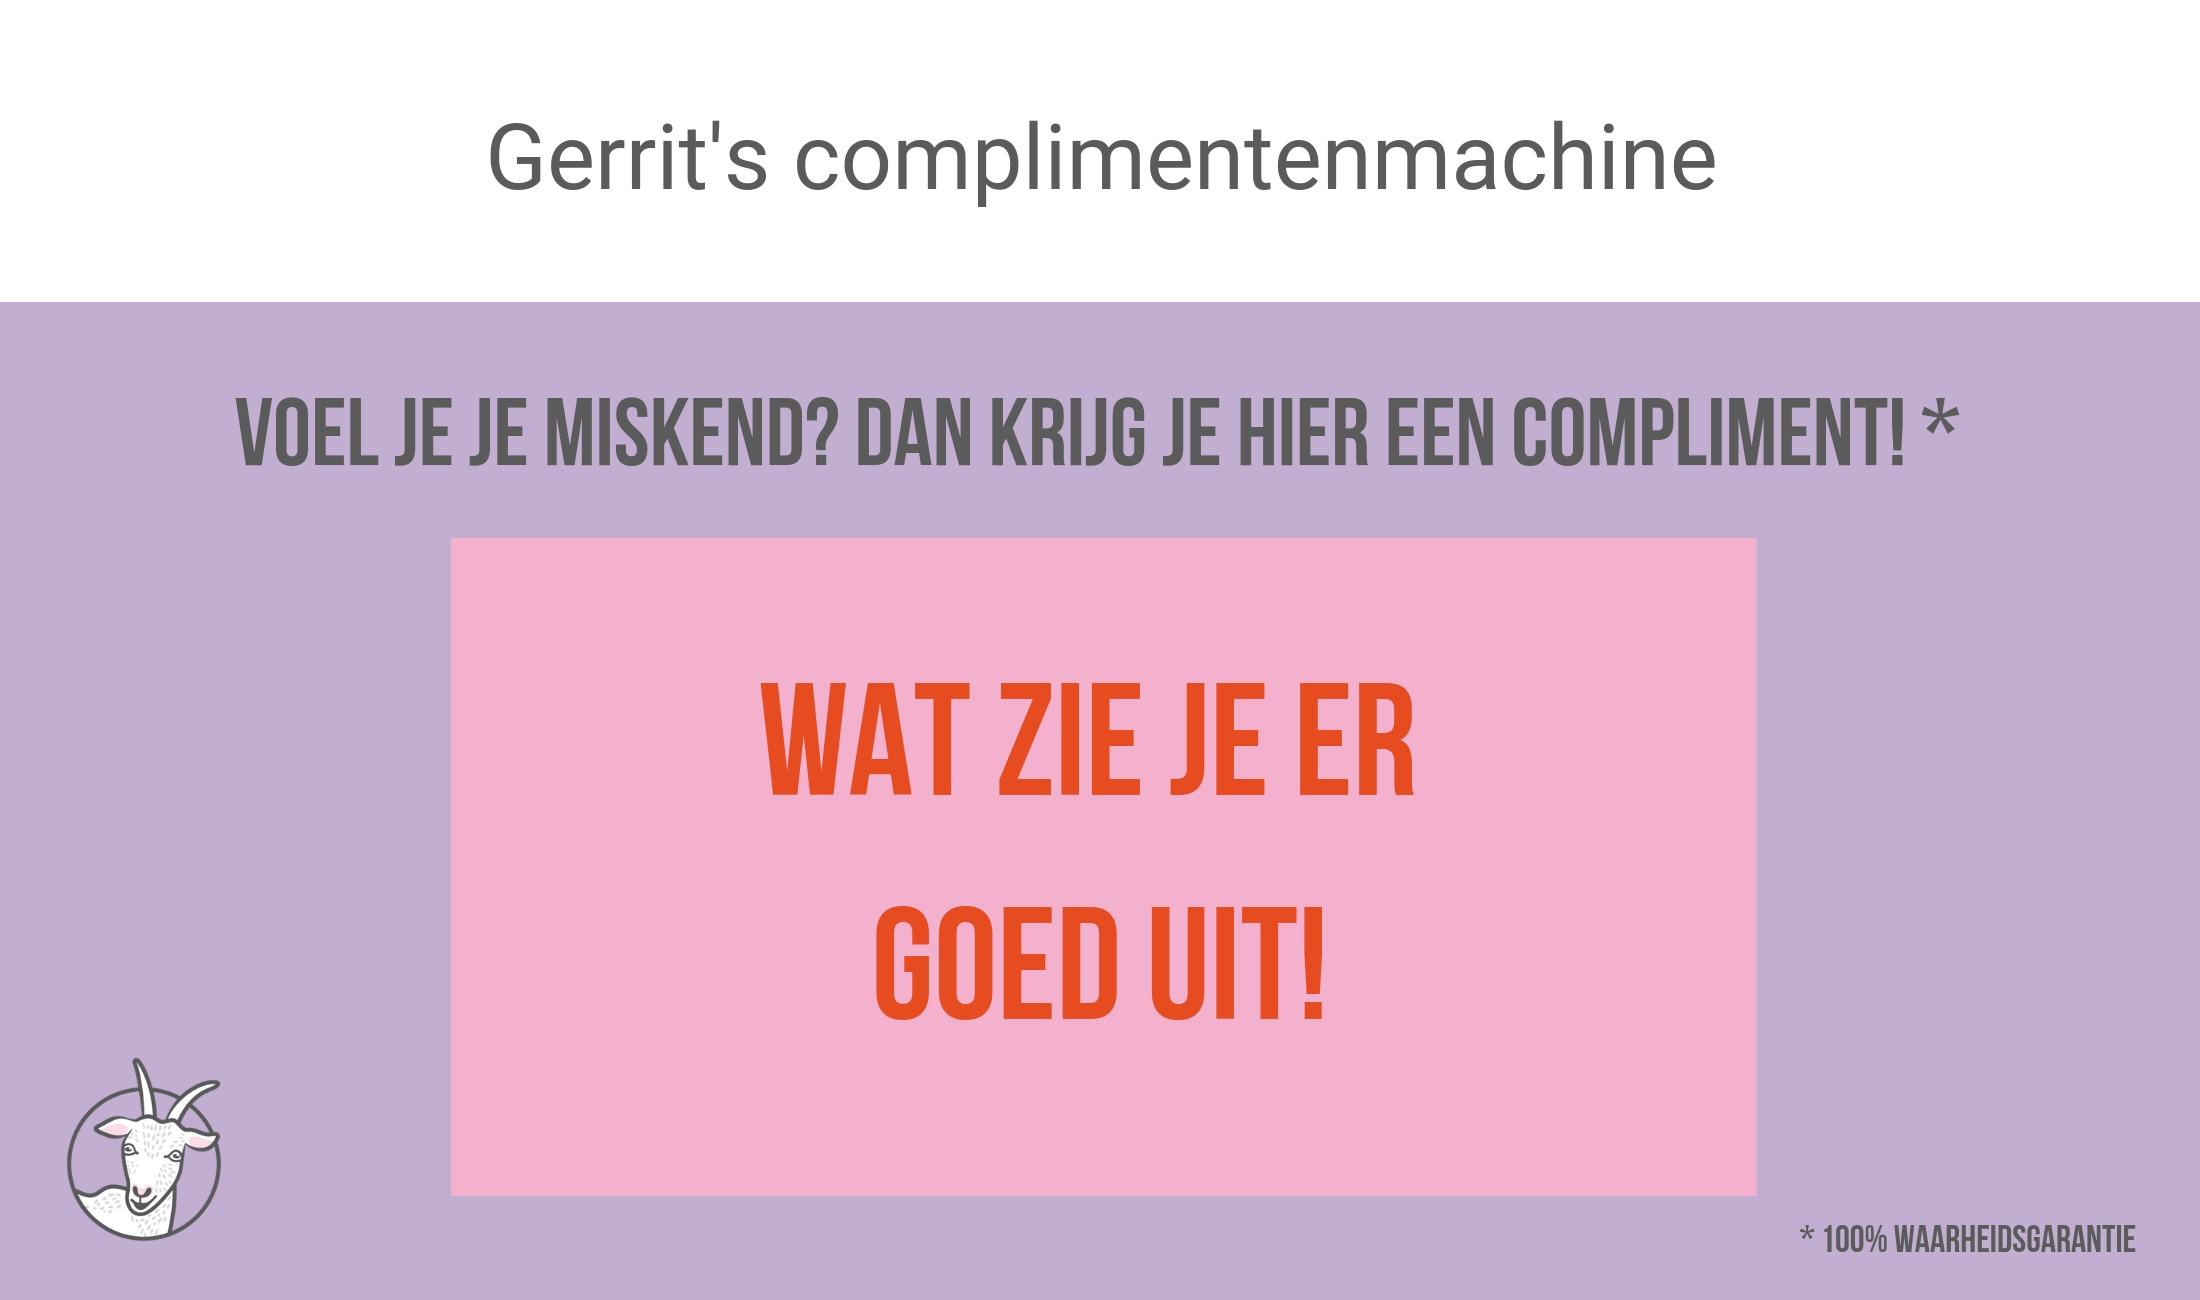 Gerrit's complimentenmachine